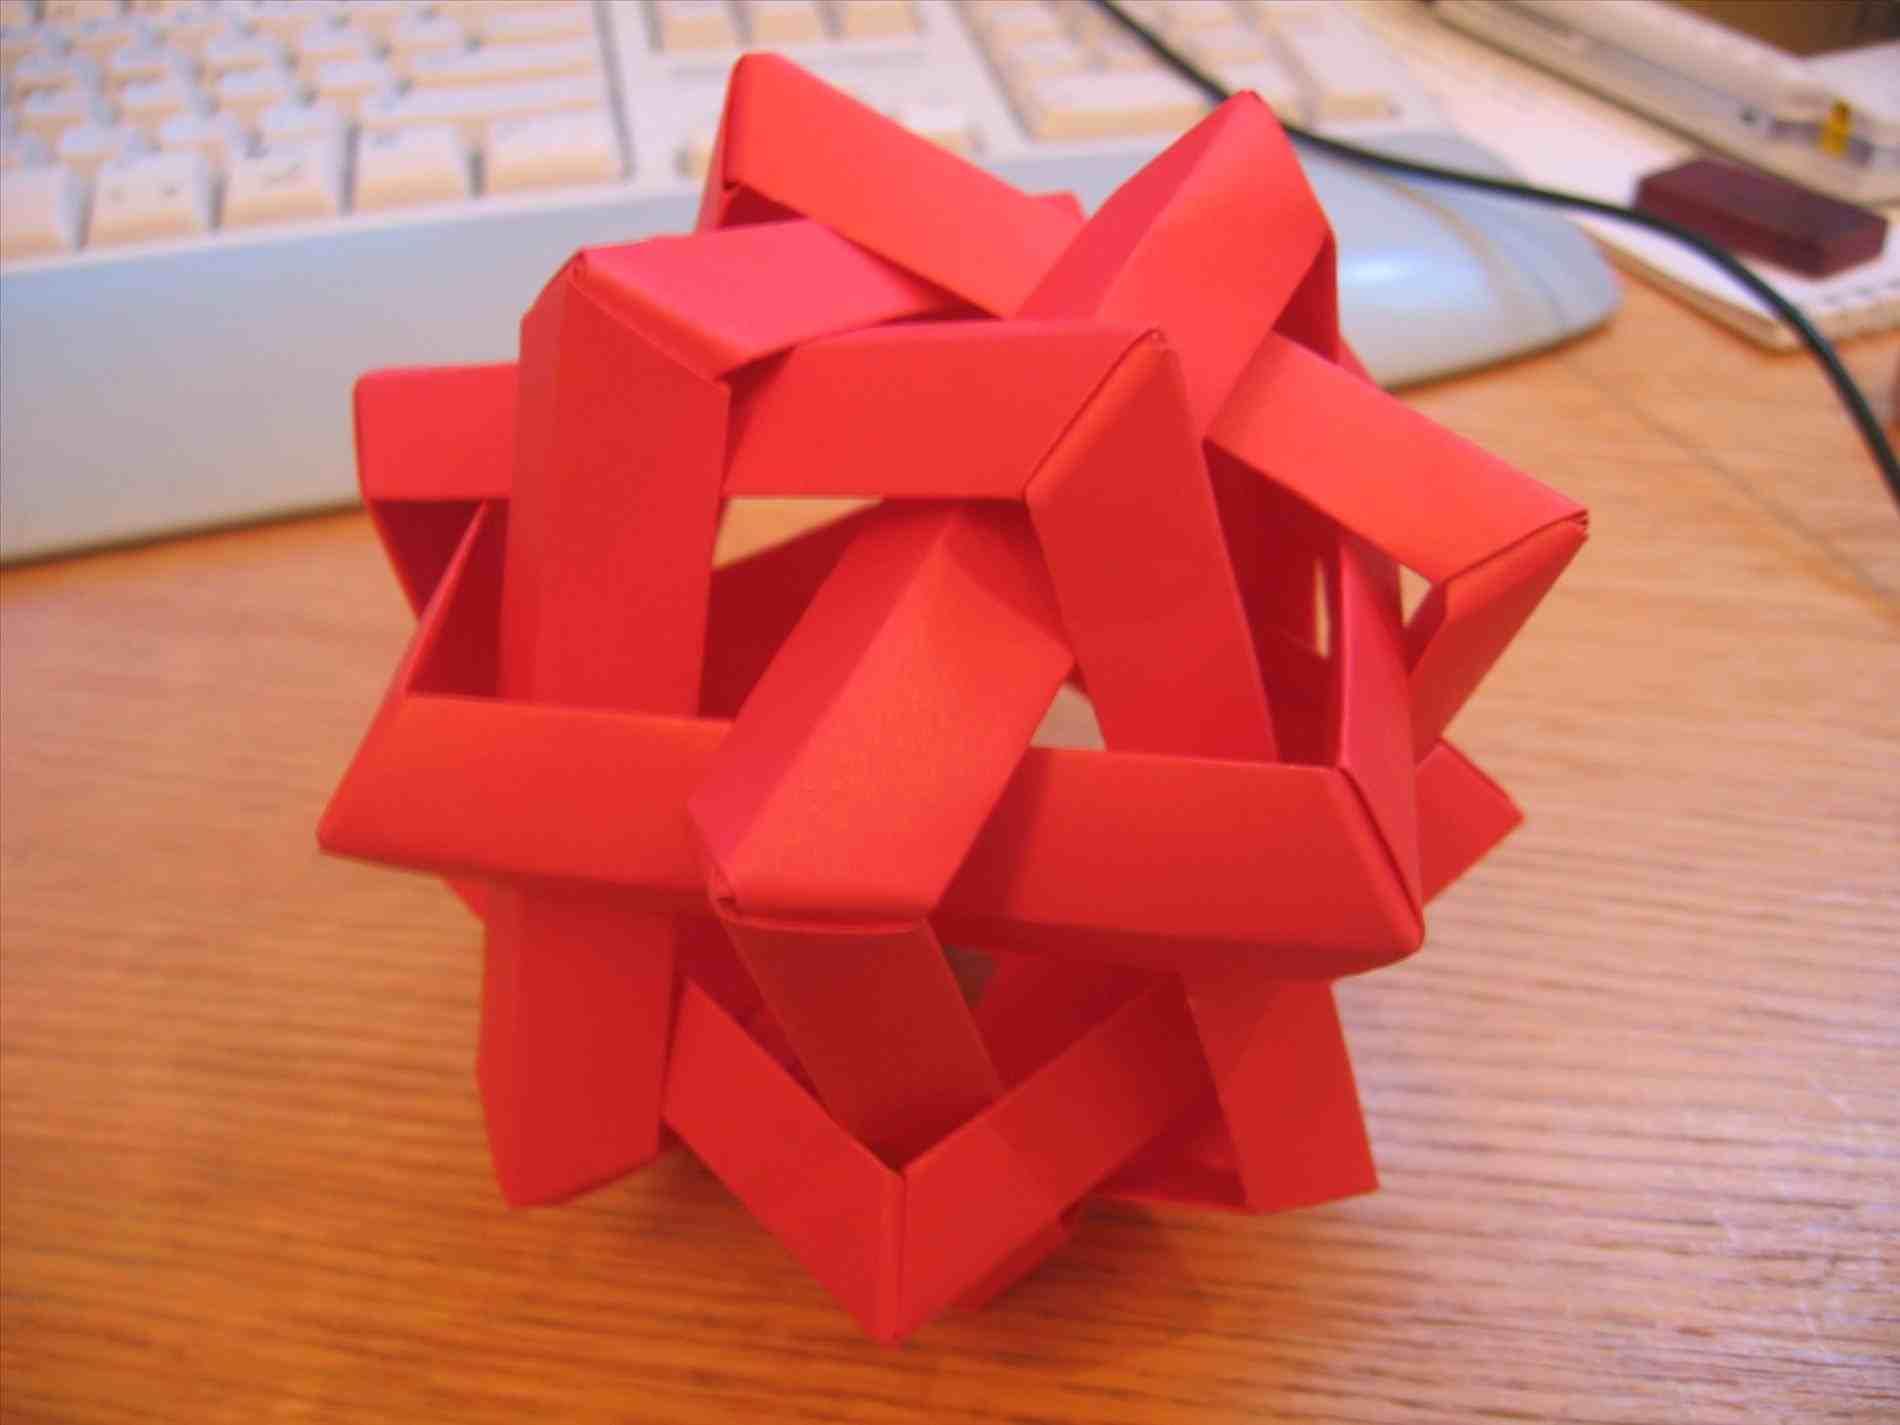 How To Make a Paper Ninja Star 2 (Shuriken) - Origami - YouTube | 1425x1900